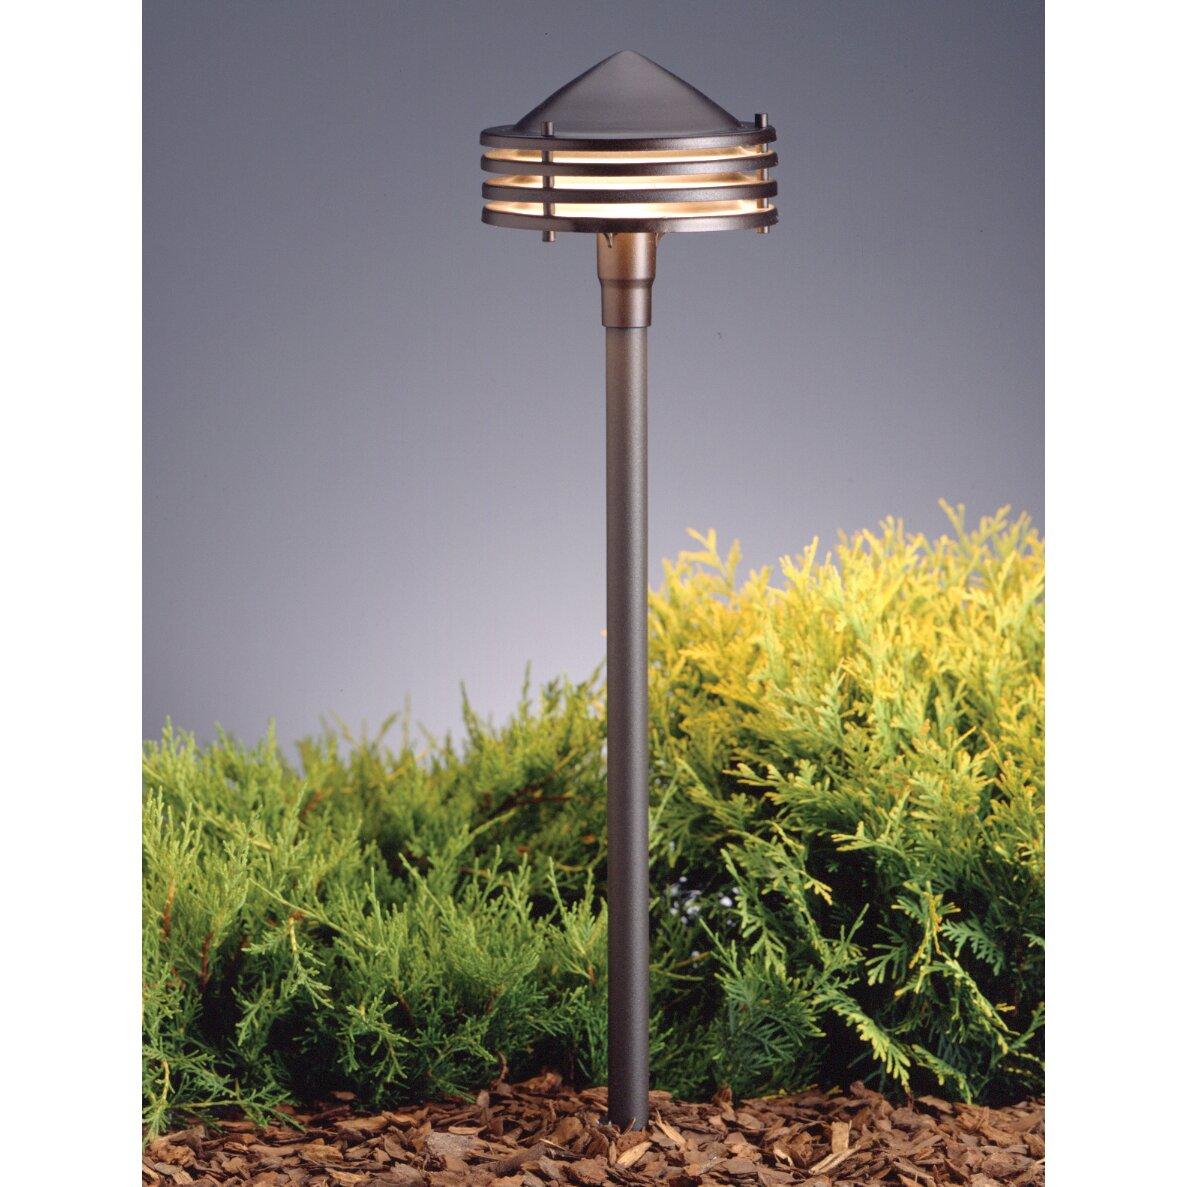 Kichler Landscape Lighting Reviews : Kichler led pathway lighting reviews wayfair